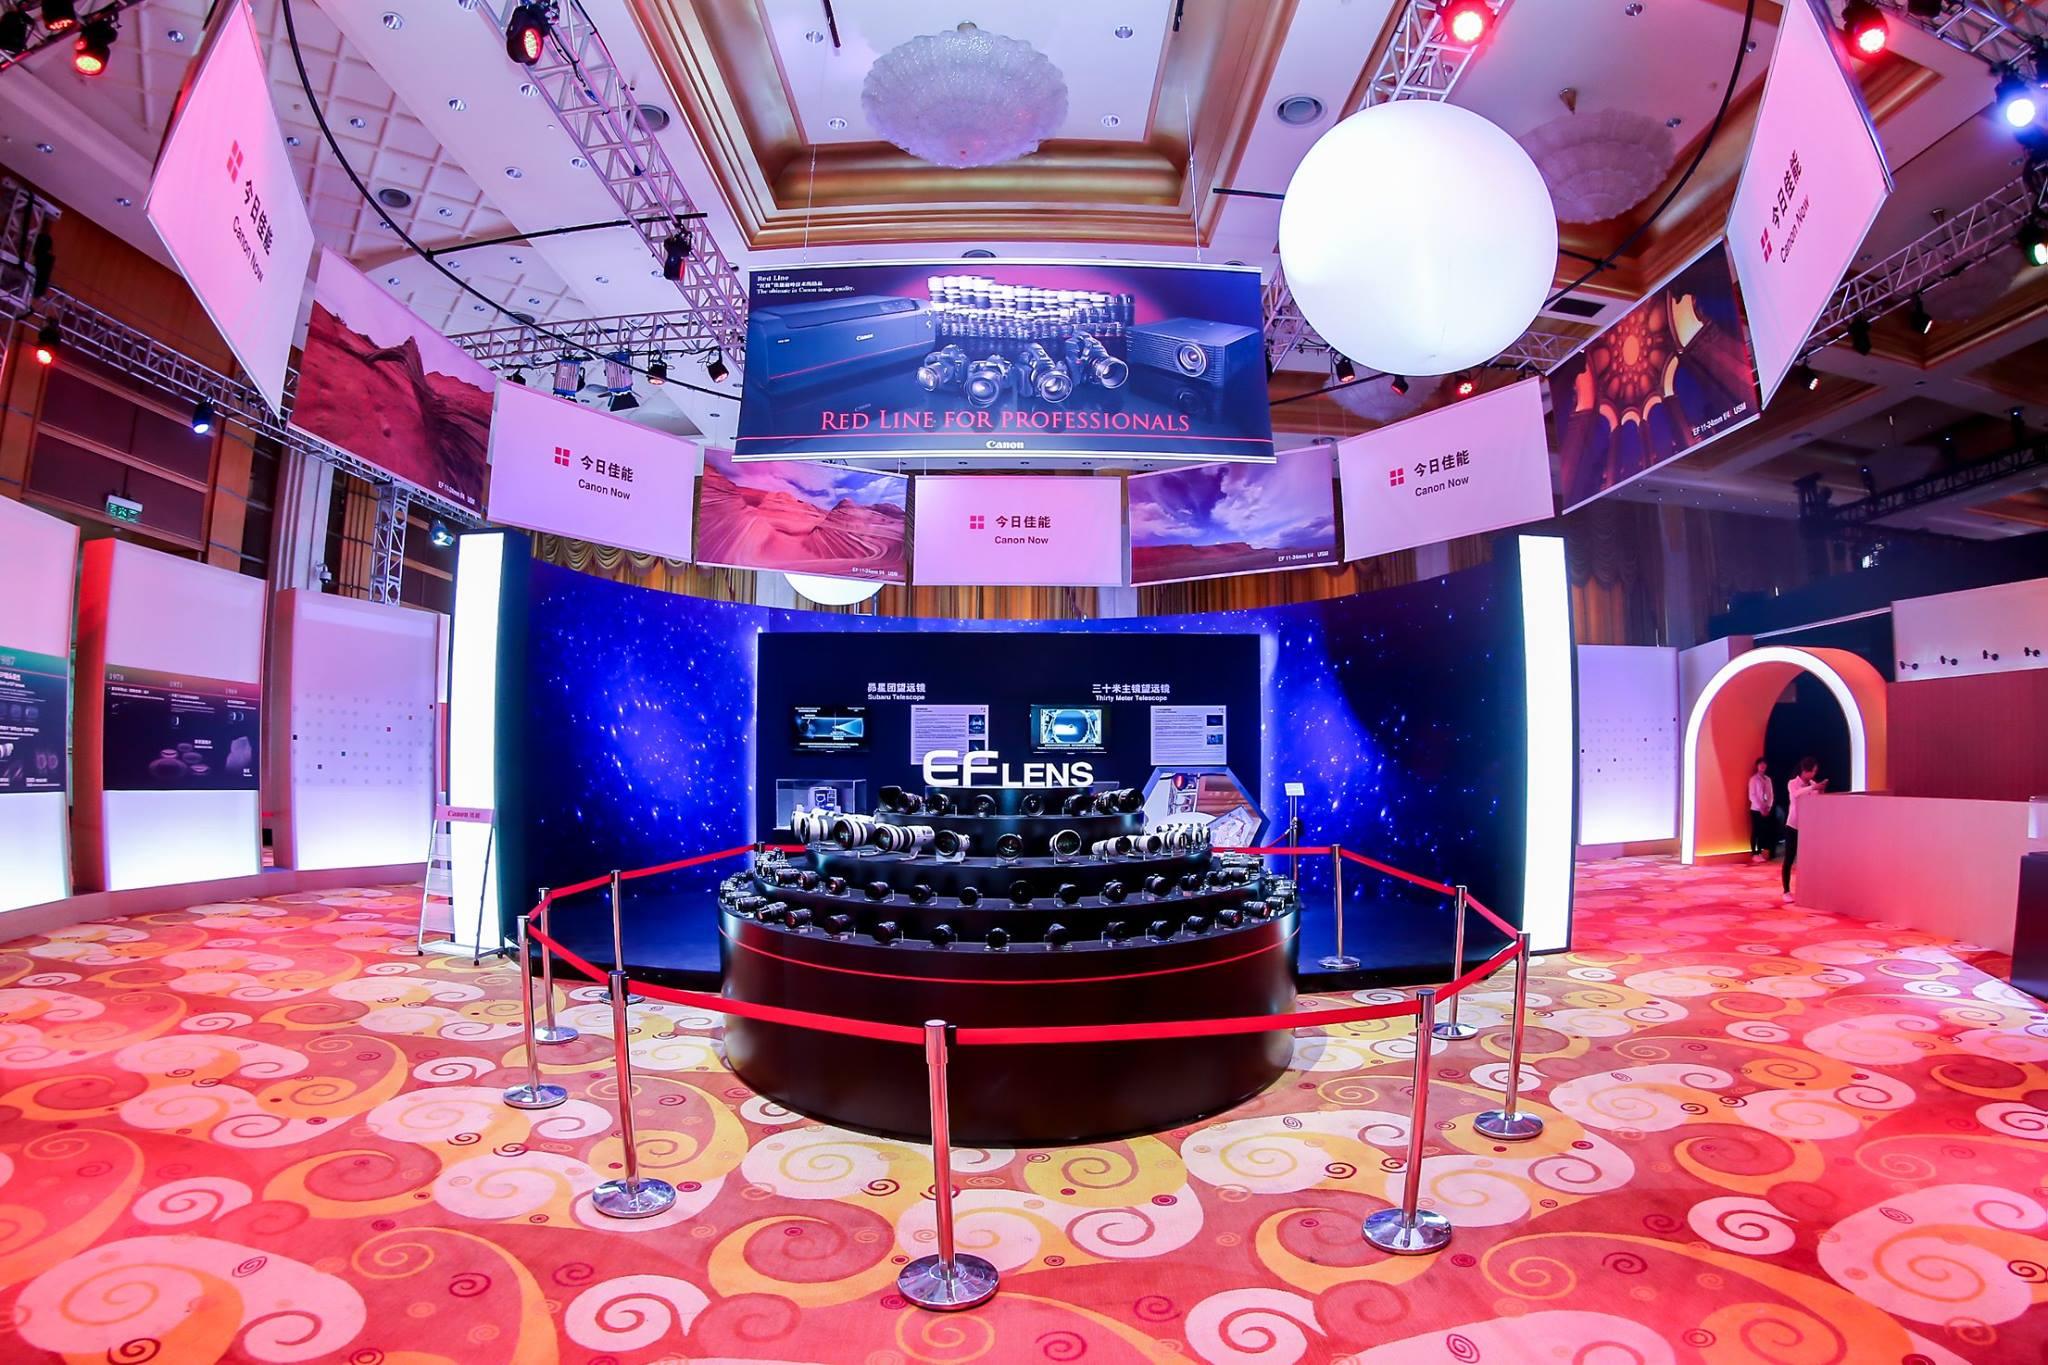 8K CAM。VR。1.2 億像單反 - 5 分鐘睇盡 Canon EXPO 2016 Shanghai 7 大重點